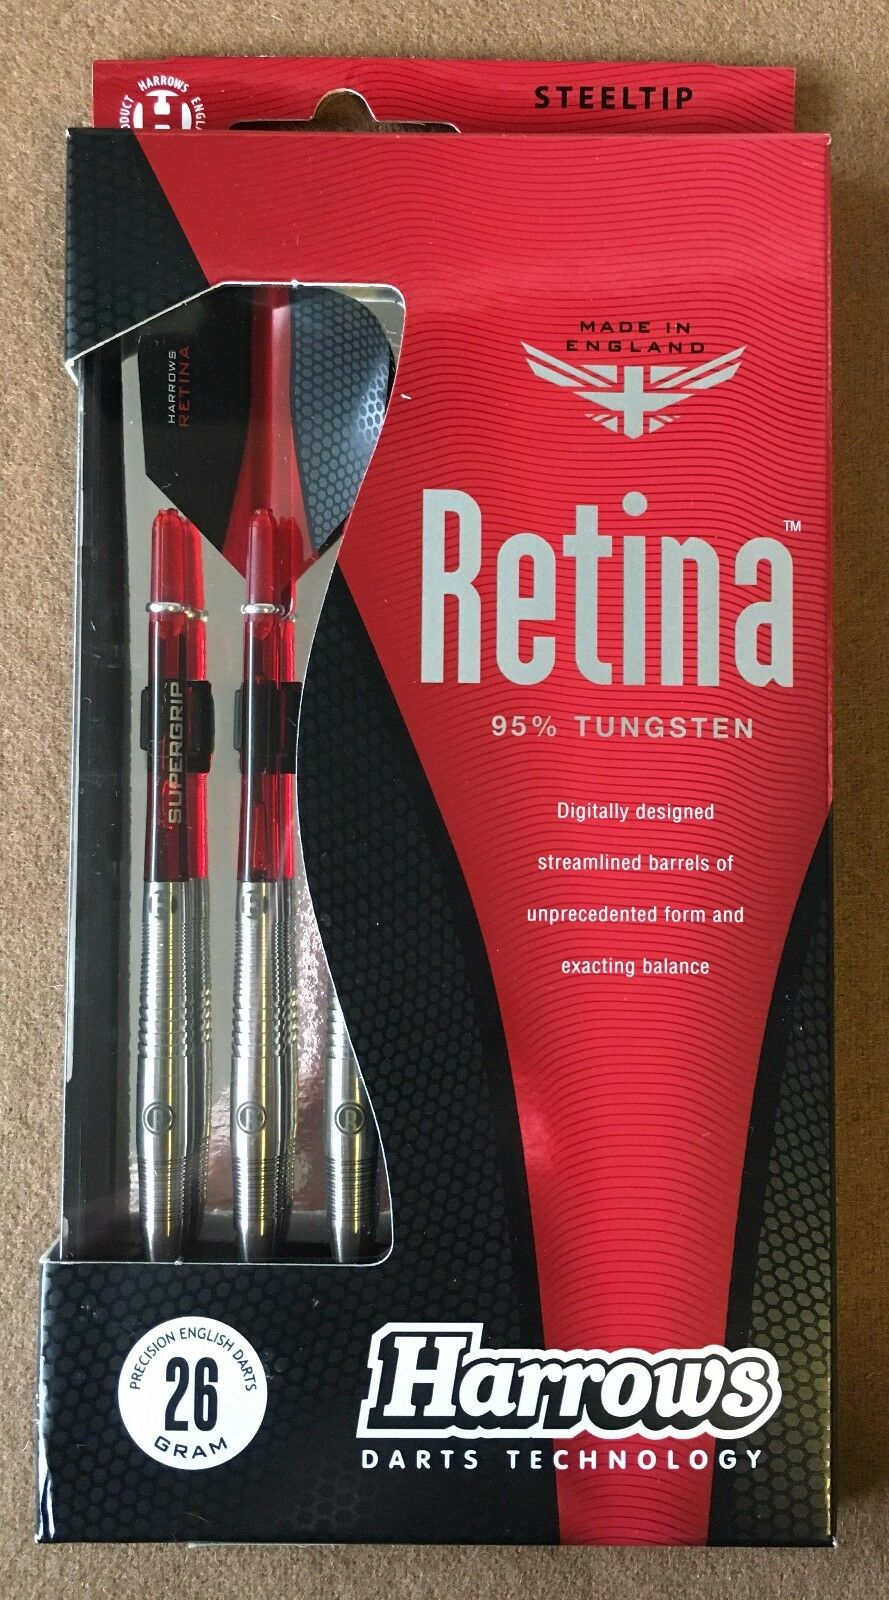 Harrows Retina 26g Steel Tip Darts w/ 95% Tungsten 51936 w/ Darts FREE Shipping 50e86f